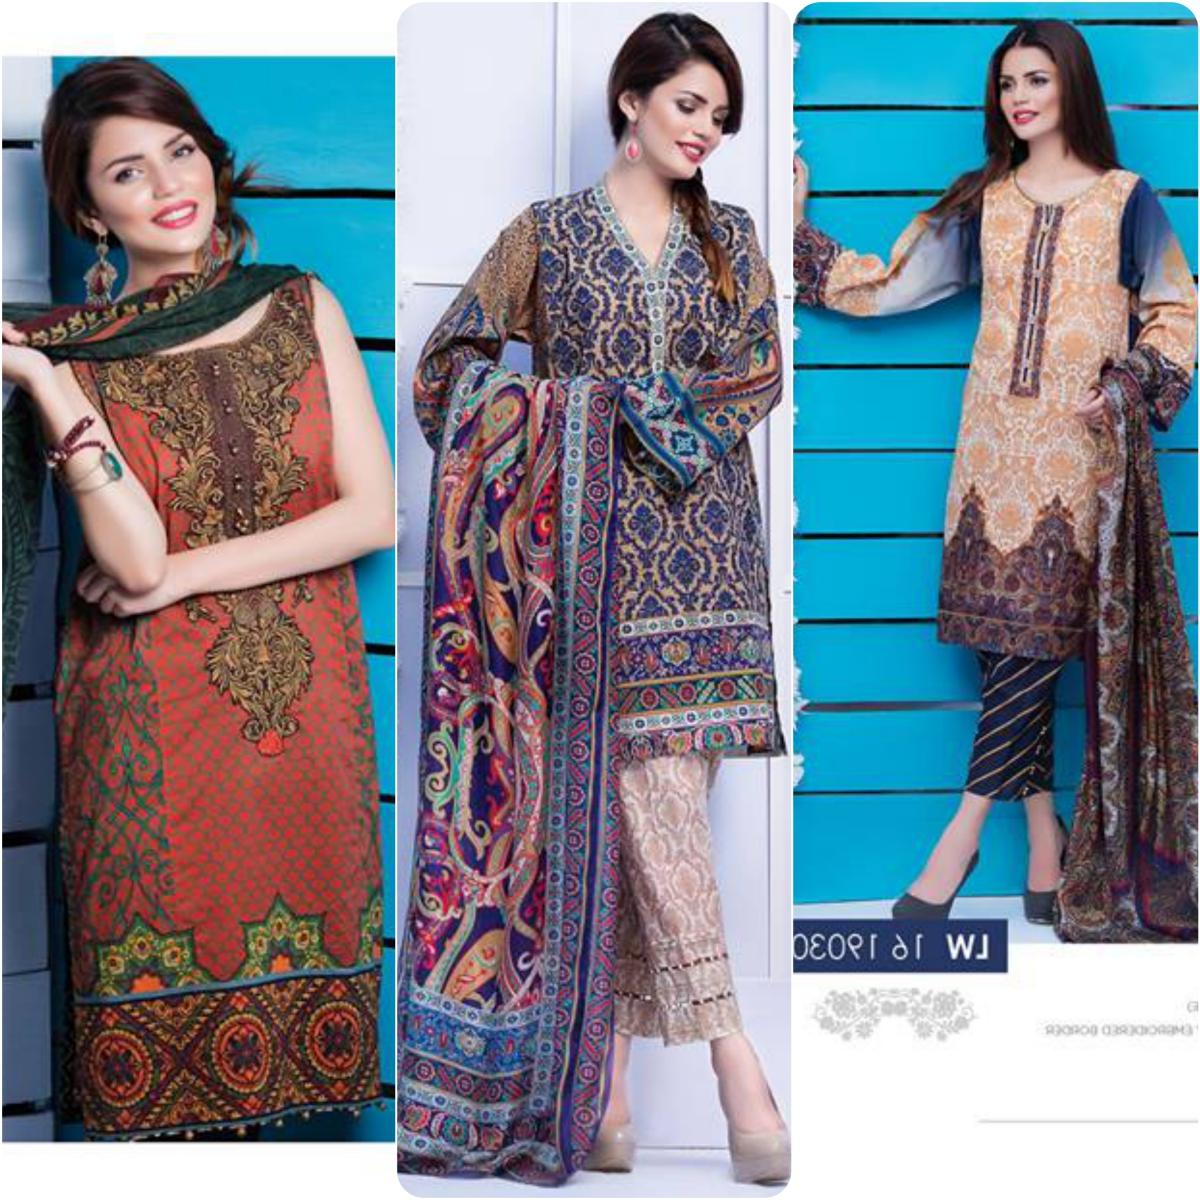 Eden Robe Festive Eid Collection for Men and Women 2016 (19)